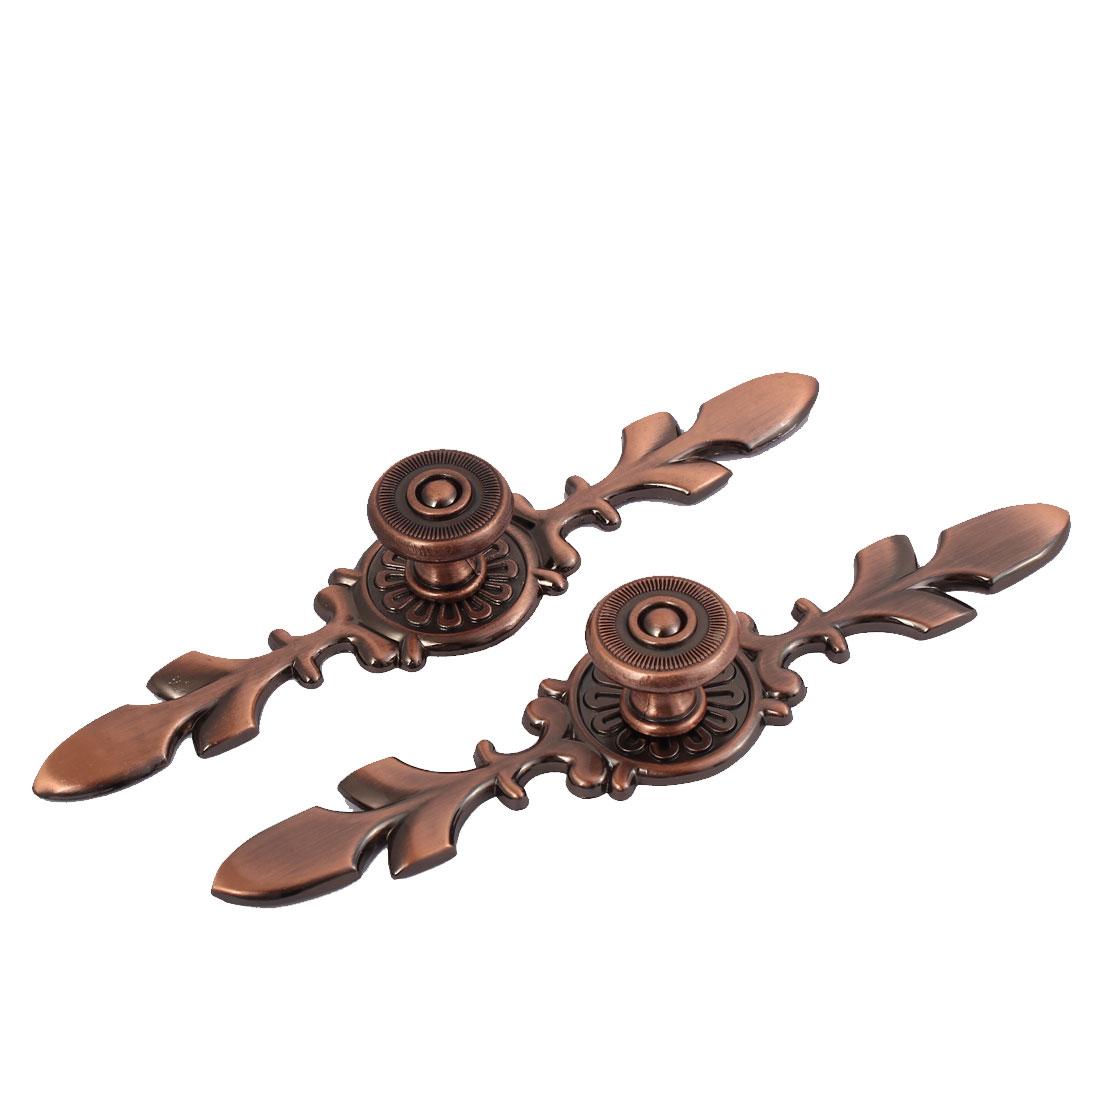 Wardrobe Drawer Dresser Pull Handle Copper Tone 2pcs